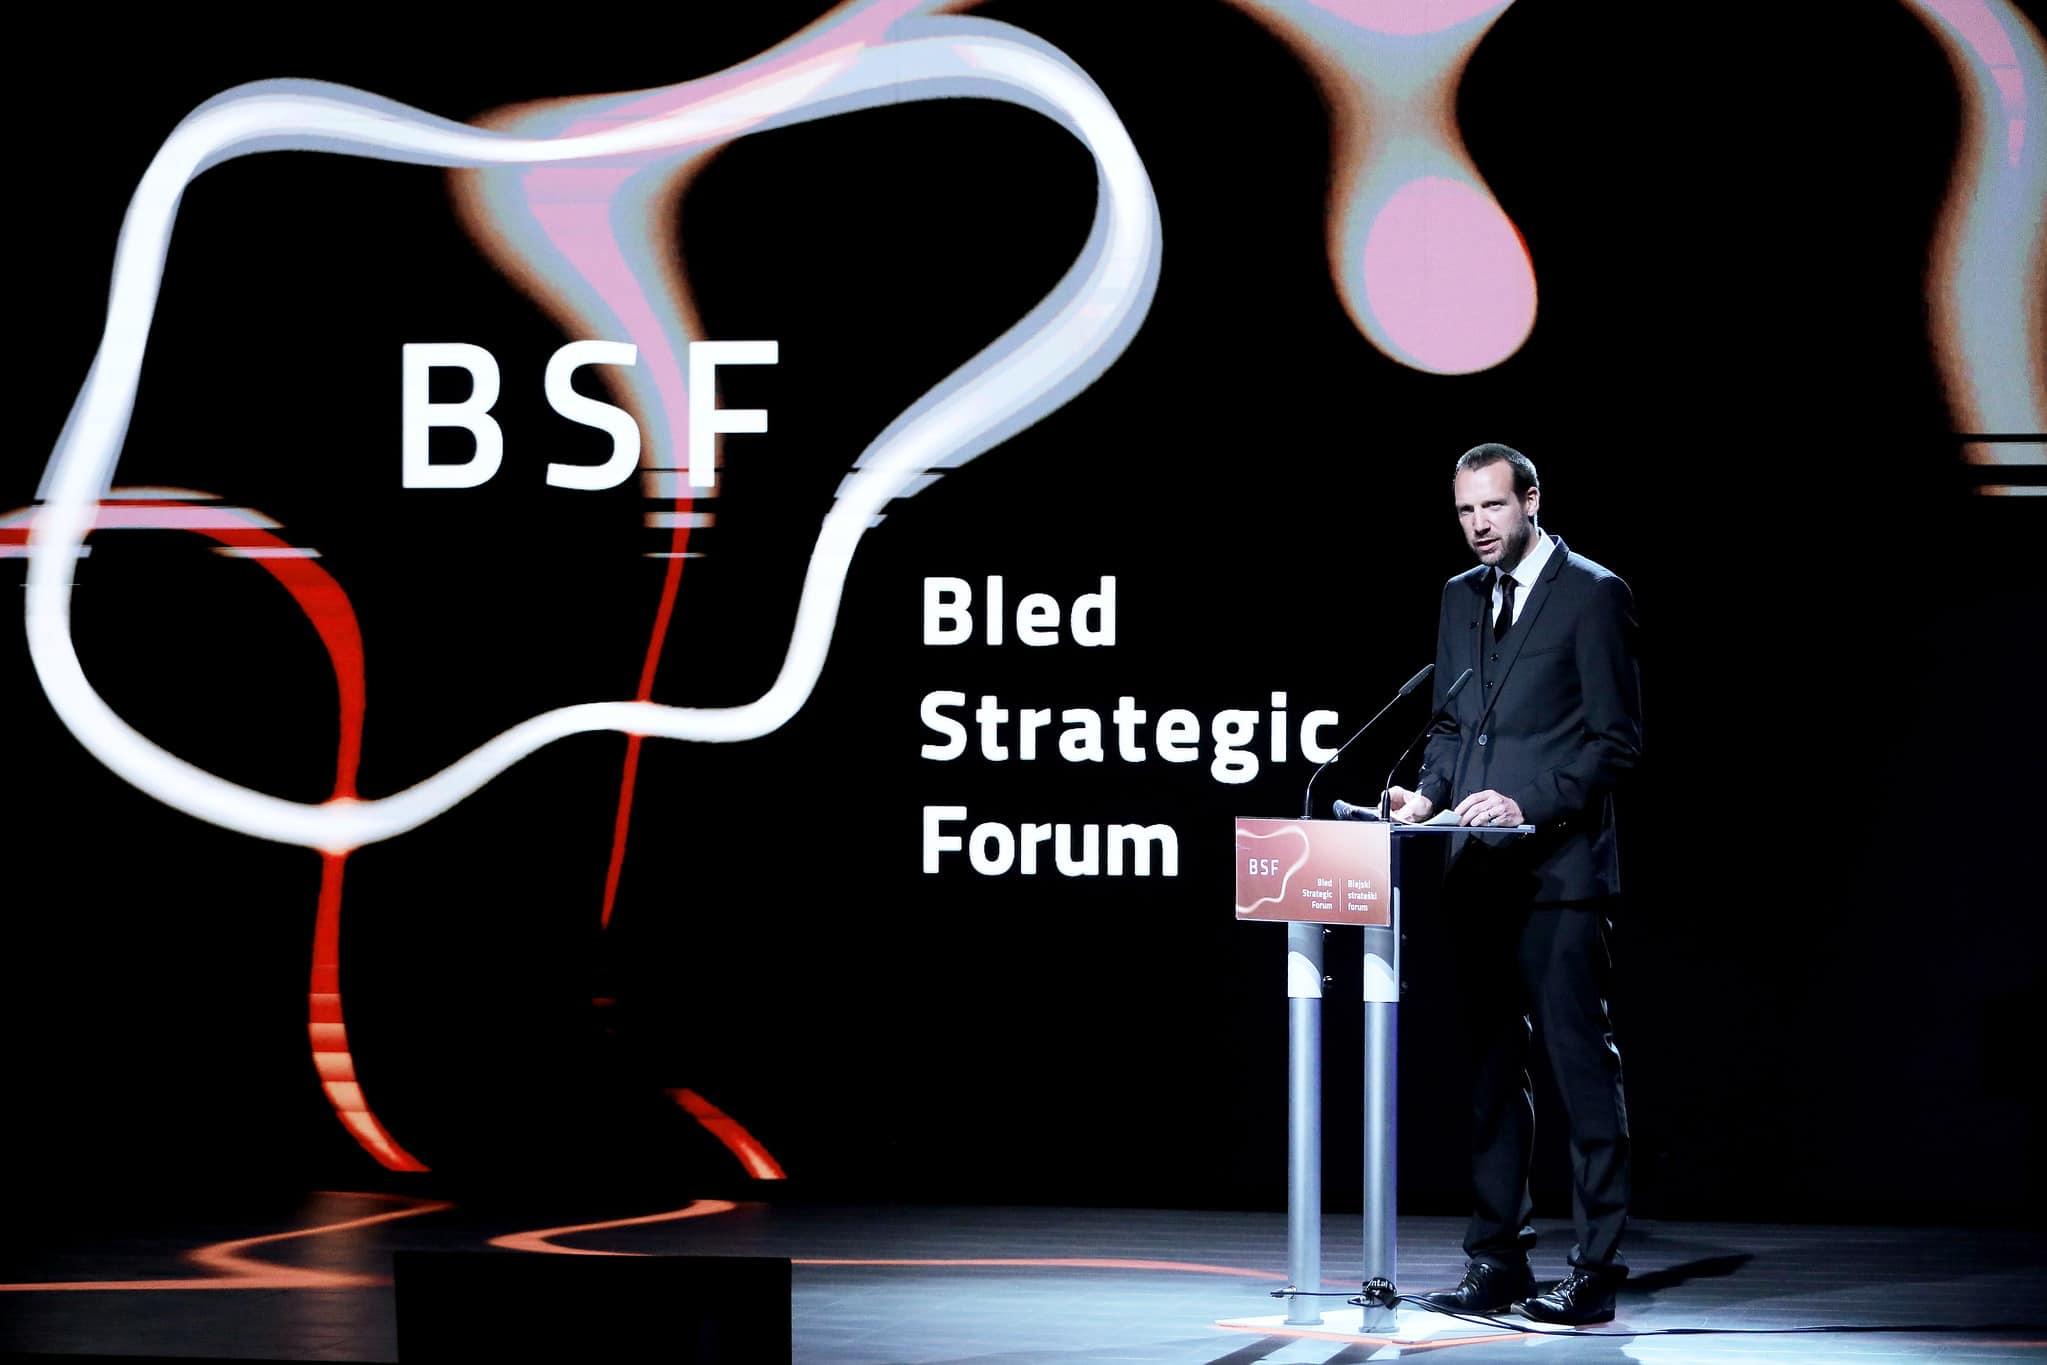 bled-strategic-forum-slovenia